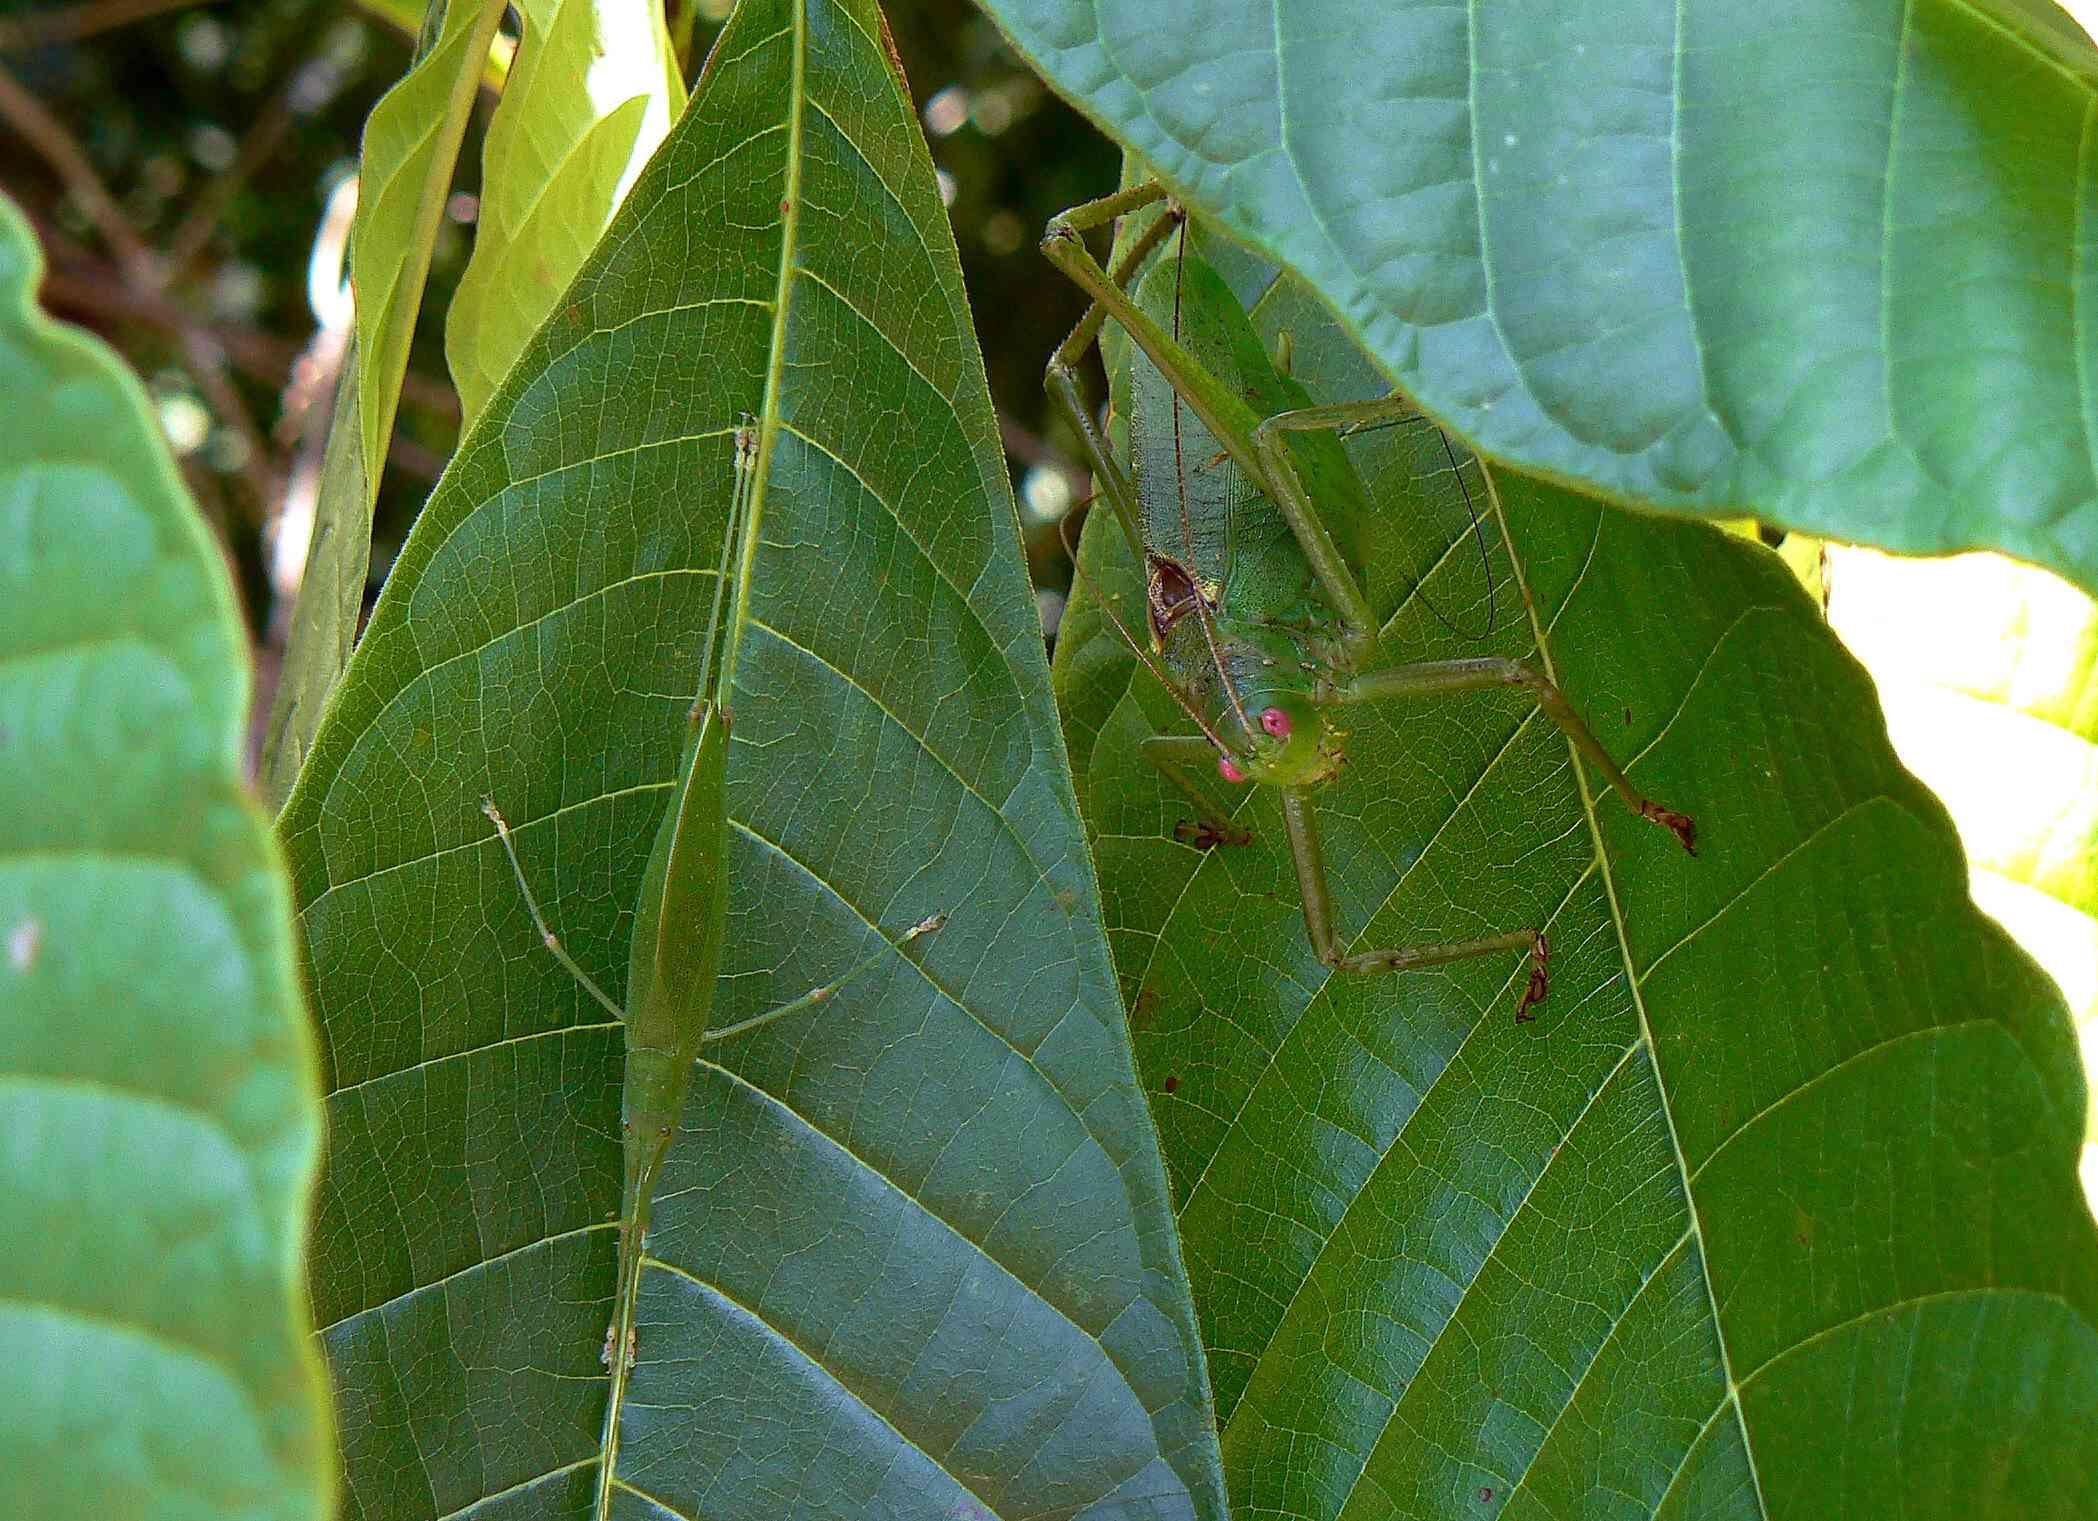 two green katydids perch on large green leaves